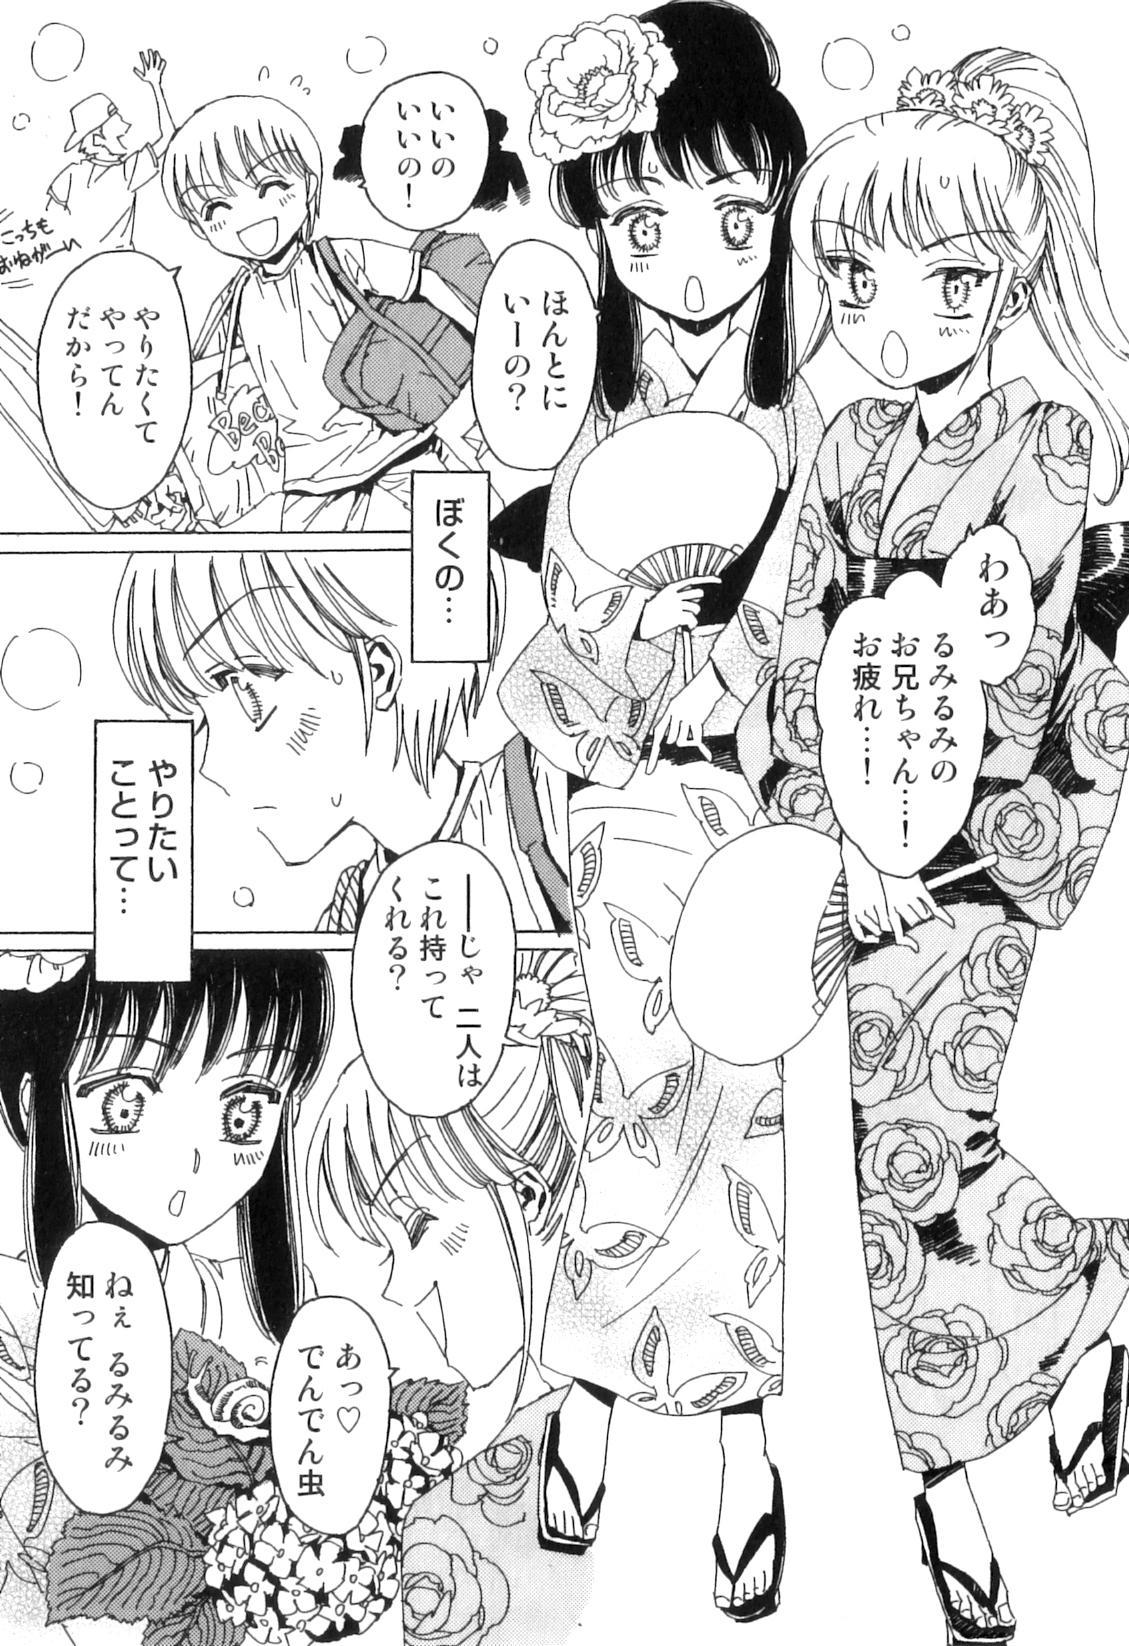 Yuni-Hapi 57